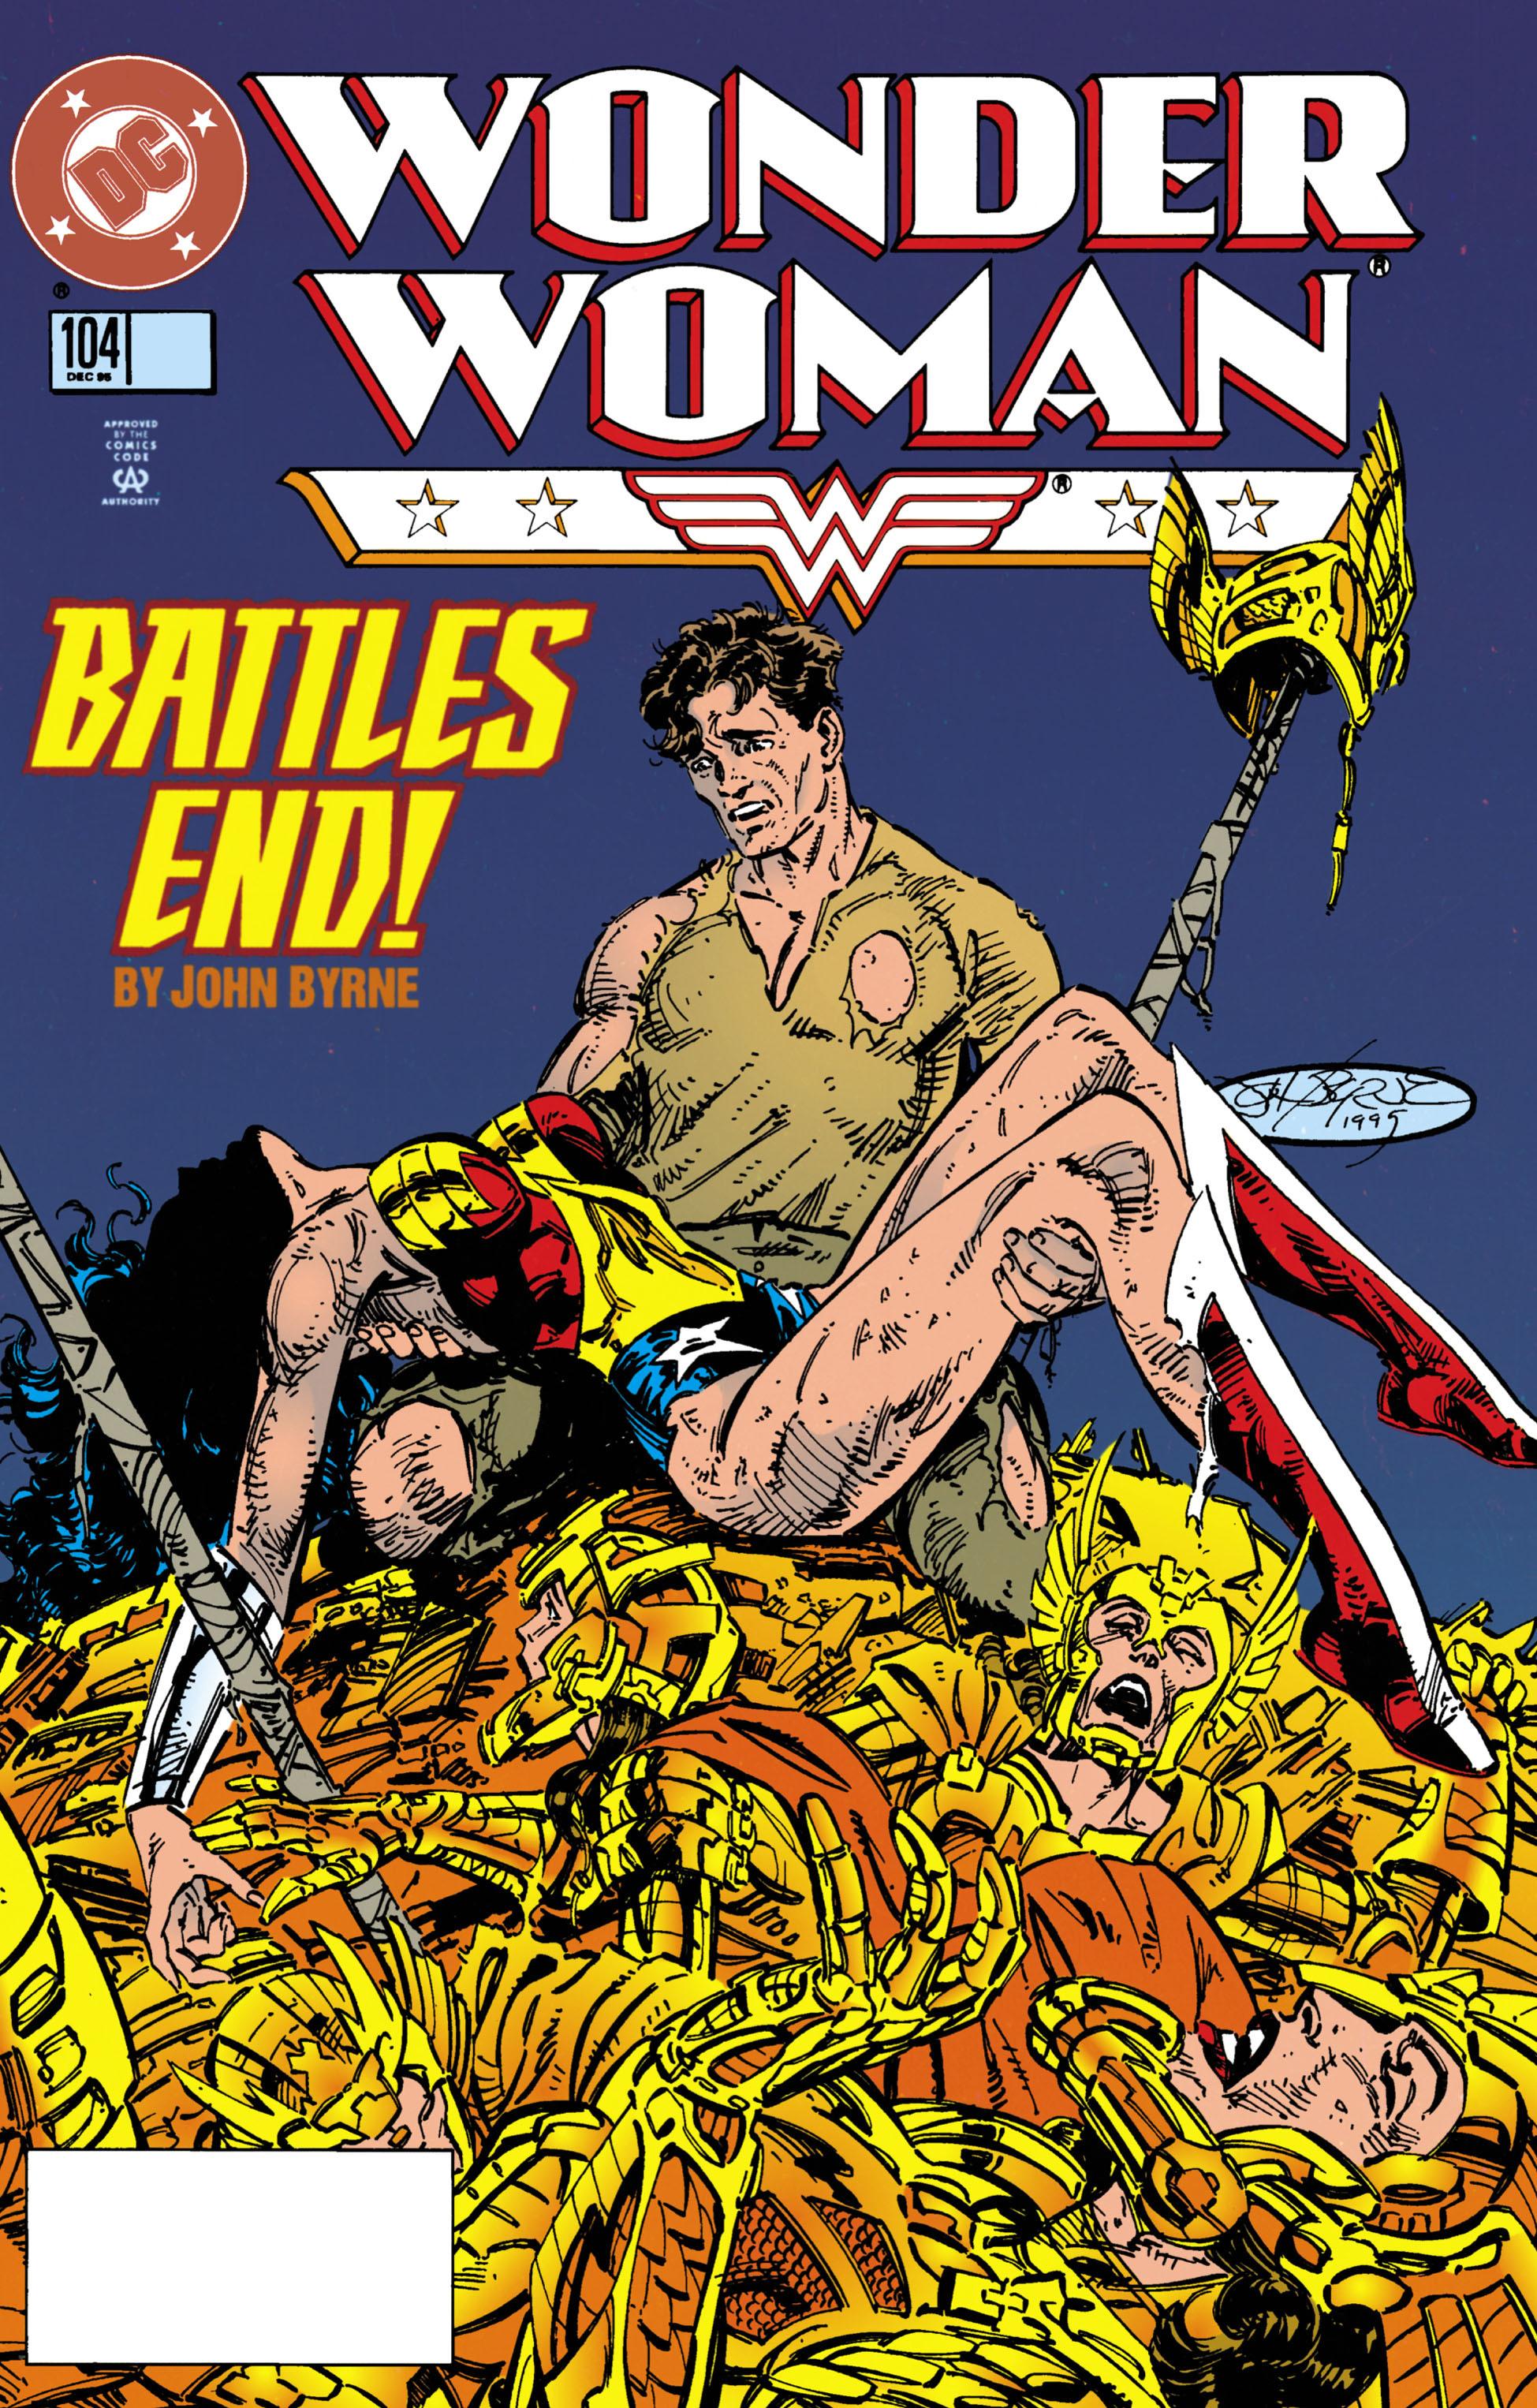 Read online Wonder Woman (1987) comic -  Issue #104 - 1